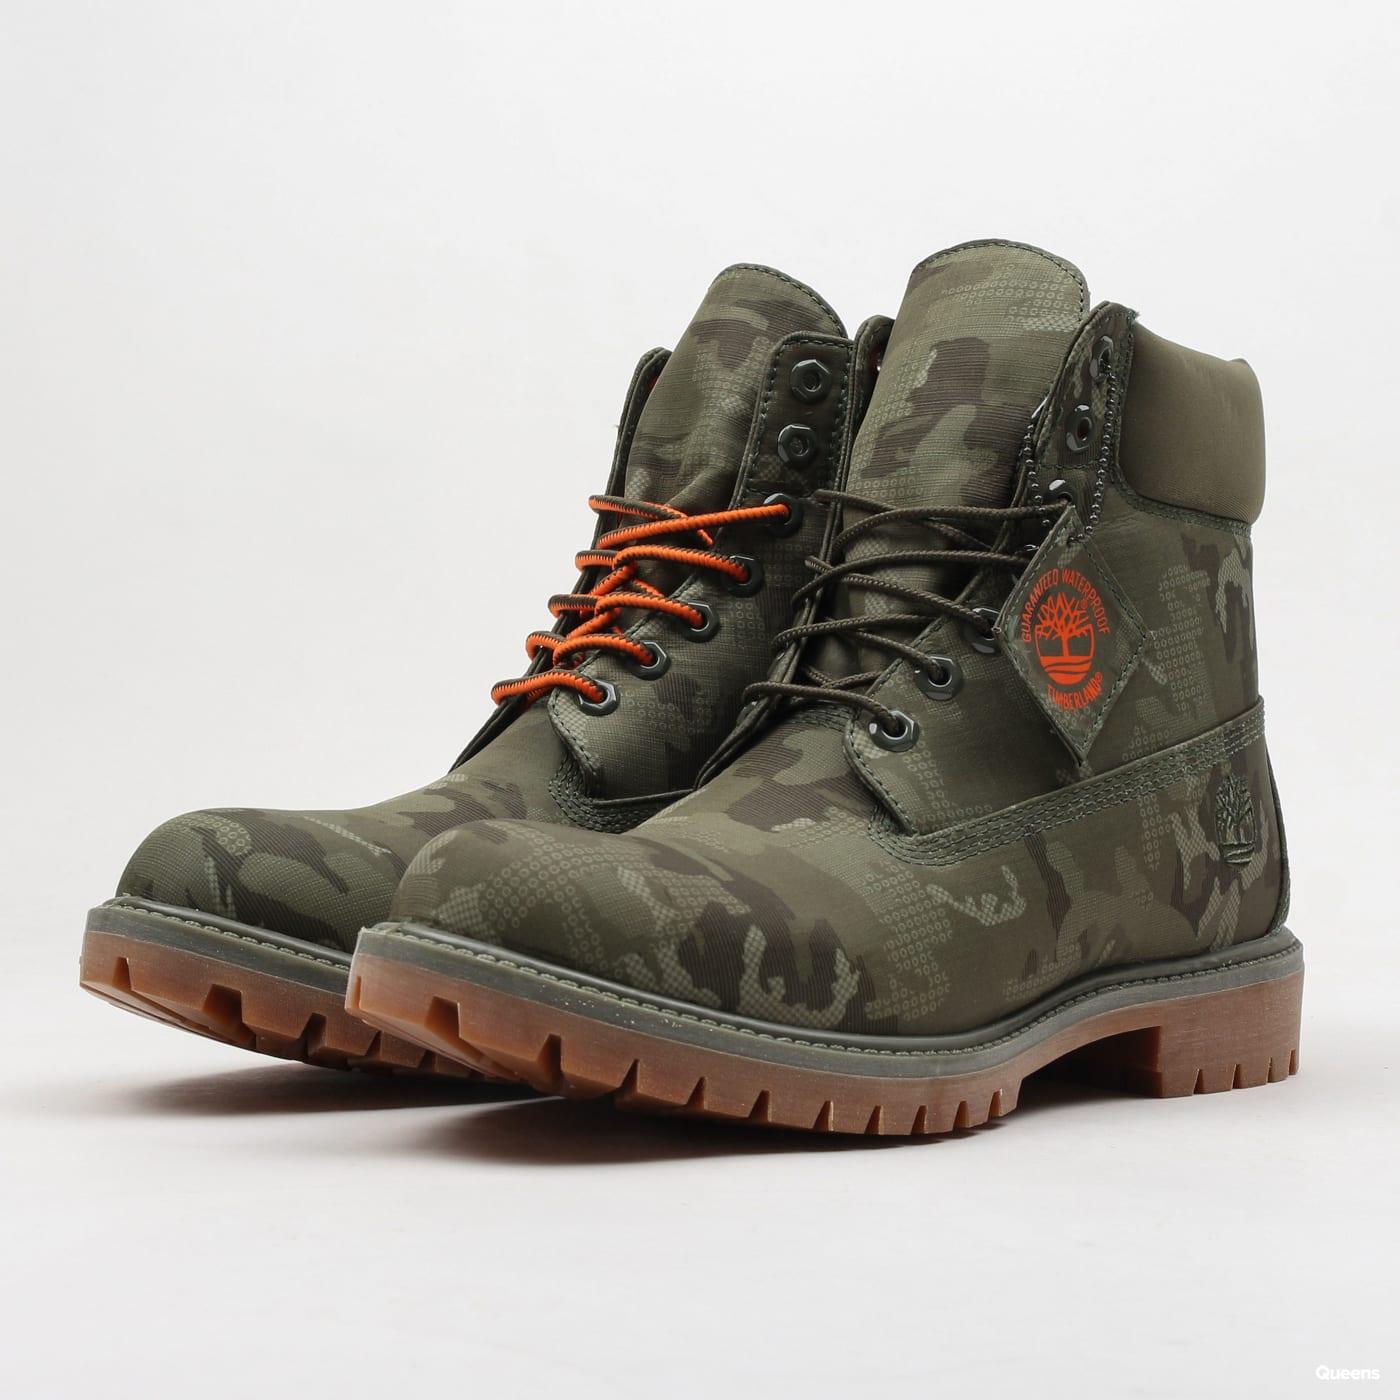 959e8536c99 Pánska zimná obuv Timberland 6 Inch Premium Fabric Boot (A1U9I - GRN)–  Queens 💚